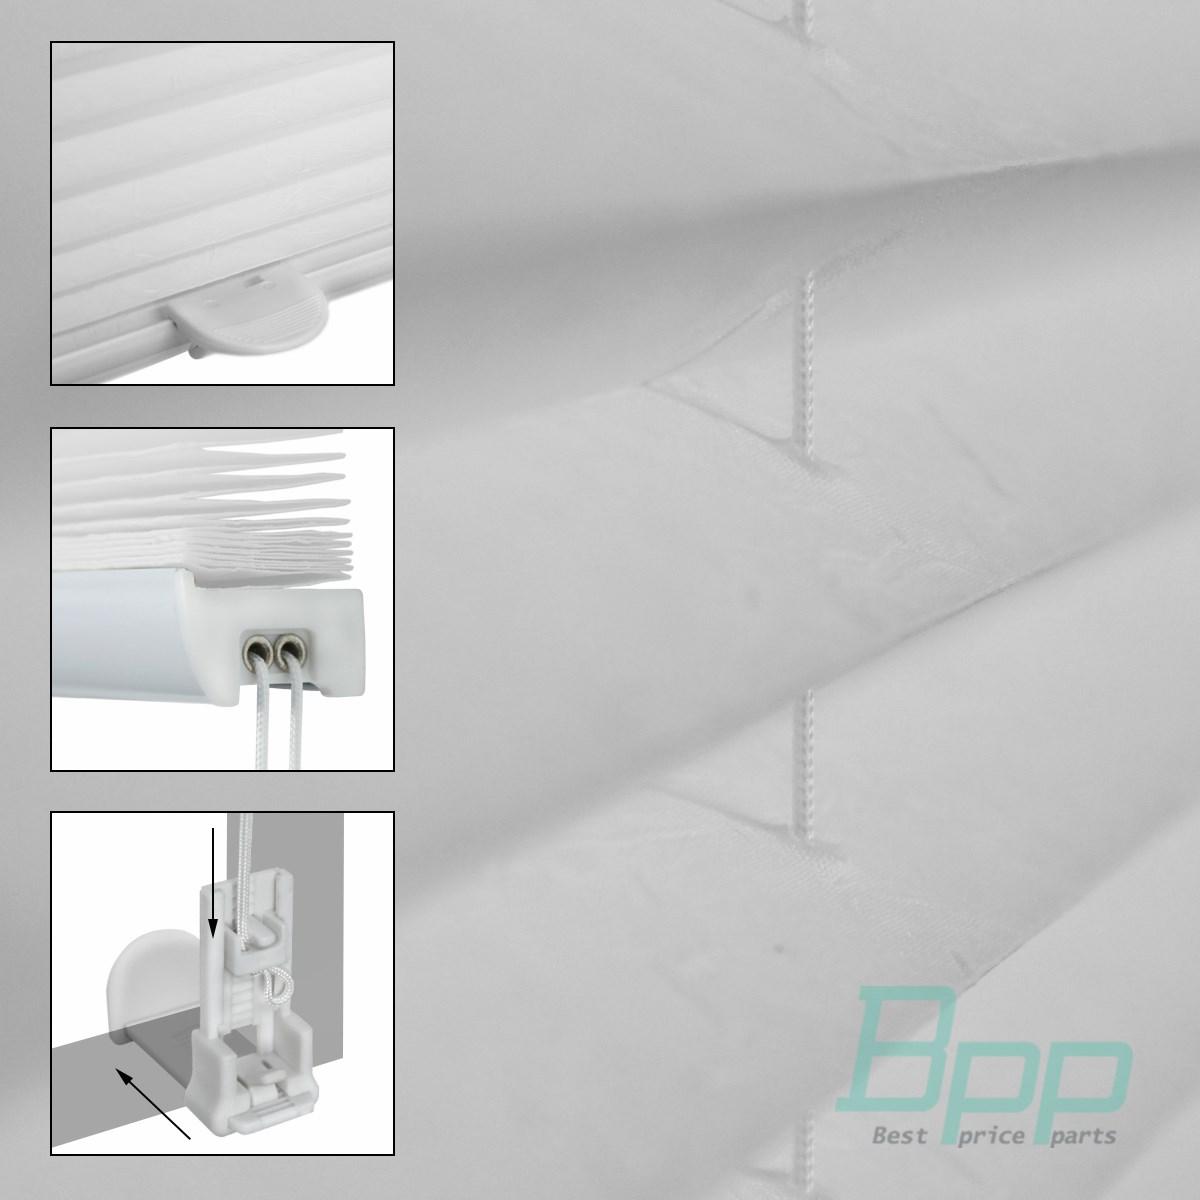 plissee faltrollo jalousie plisseerollo weiss klemmfix ohne bohren fenster t r ebay. Black Bedroom Furniture Sets. Home Design Ideas